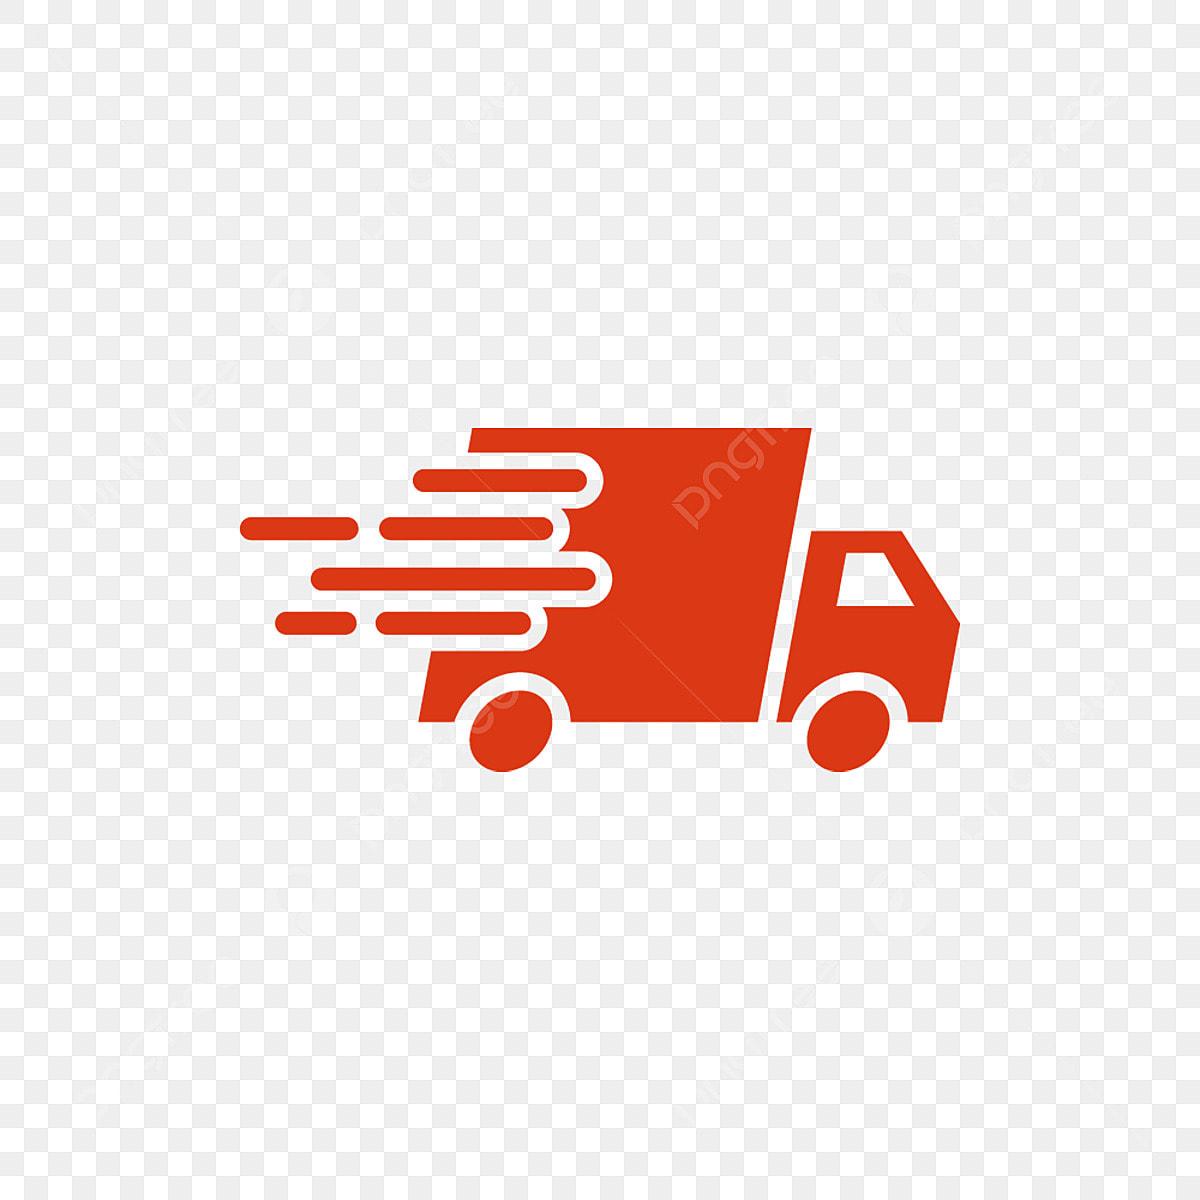 Fast Delivery Truck Icon Graphic Design Template Vector